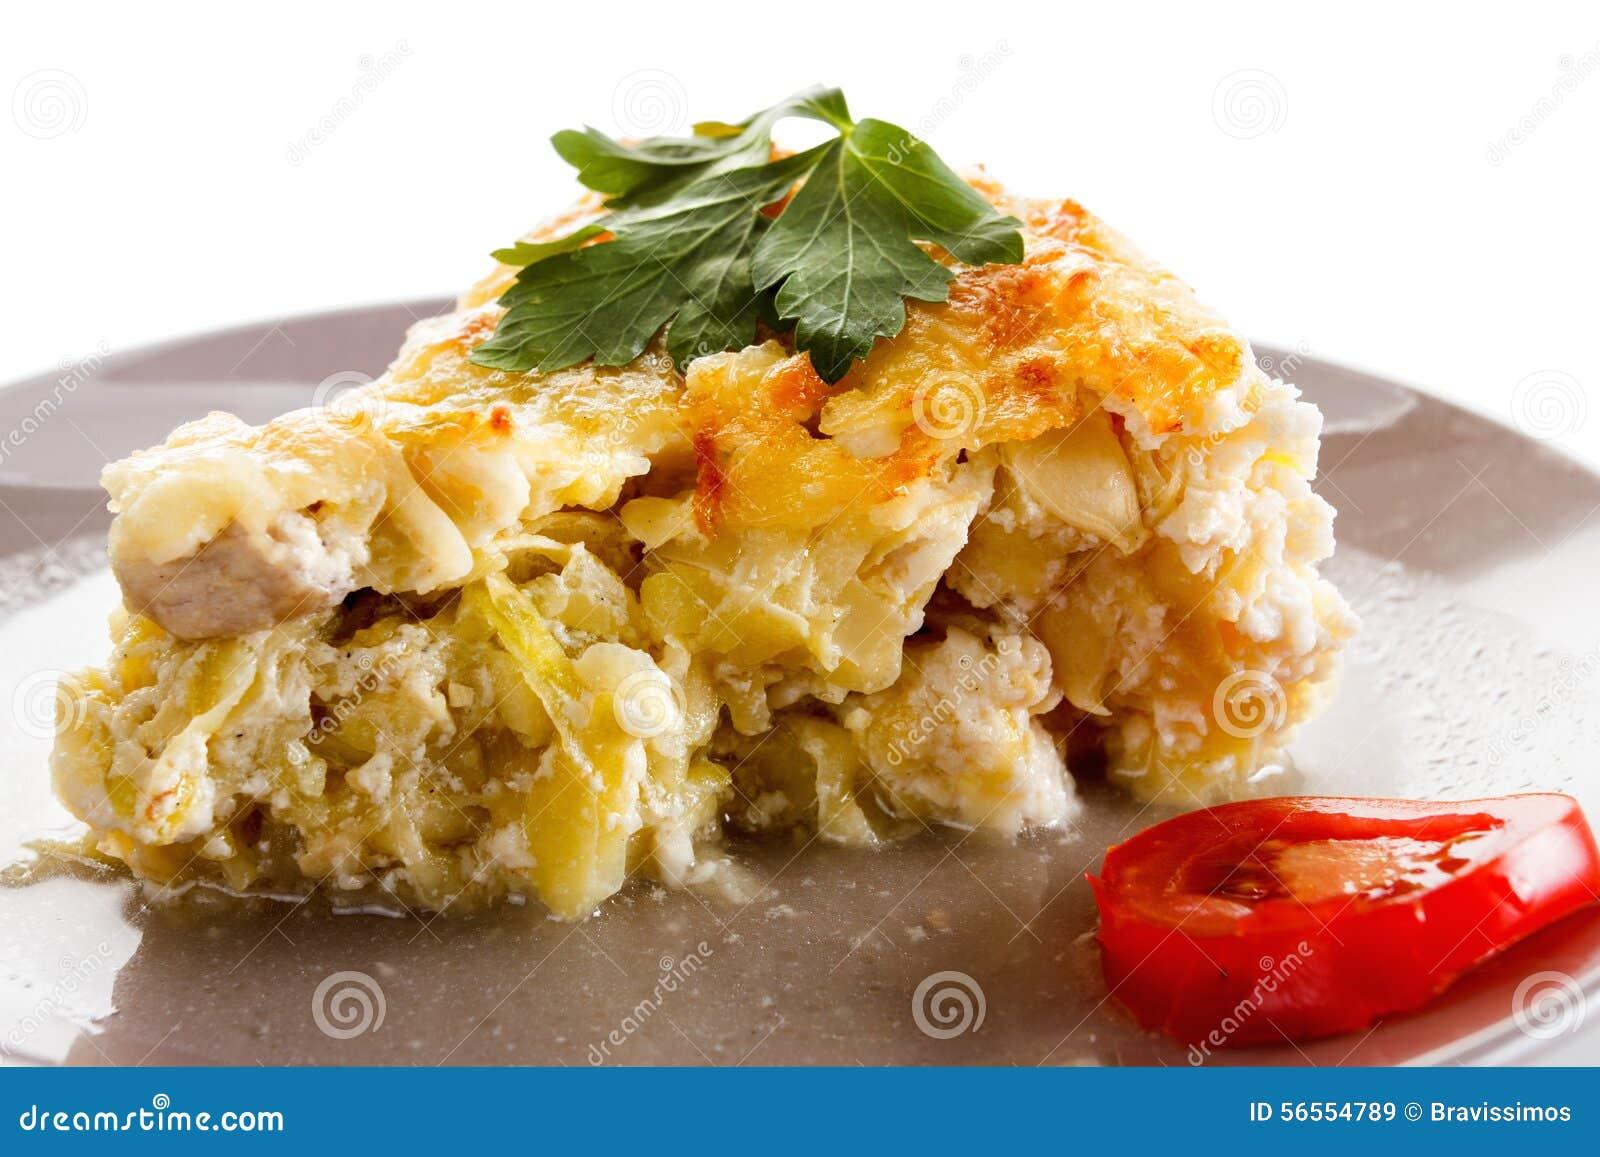 Download Casserole, η κολοκύνθη και το κρέας, τηγάνισαν με το τυρί, τυρί εξοχικών σπιτιών σε ένα γυαλί Στοκ Εικόνα - εικόνα από σκόρδο, κανένας: 56554789